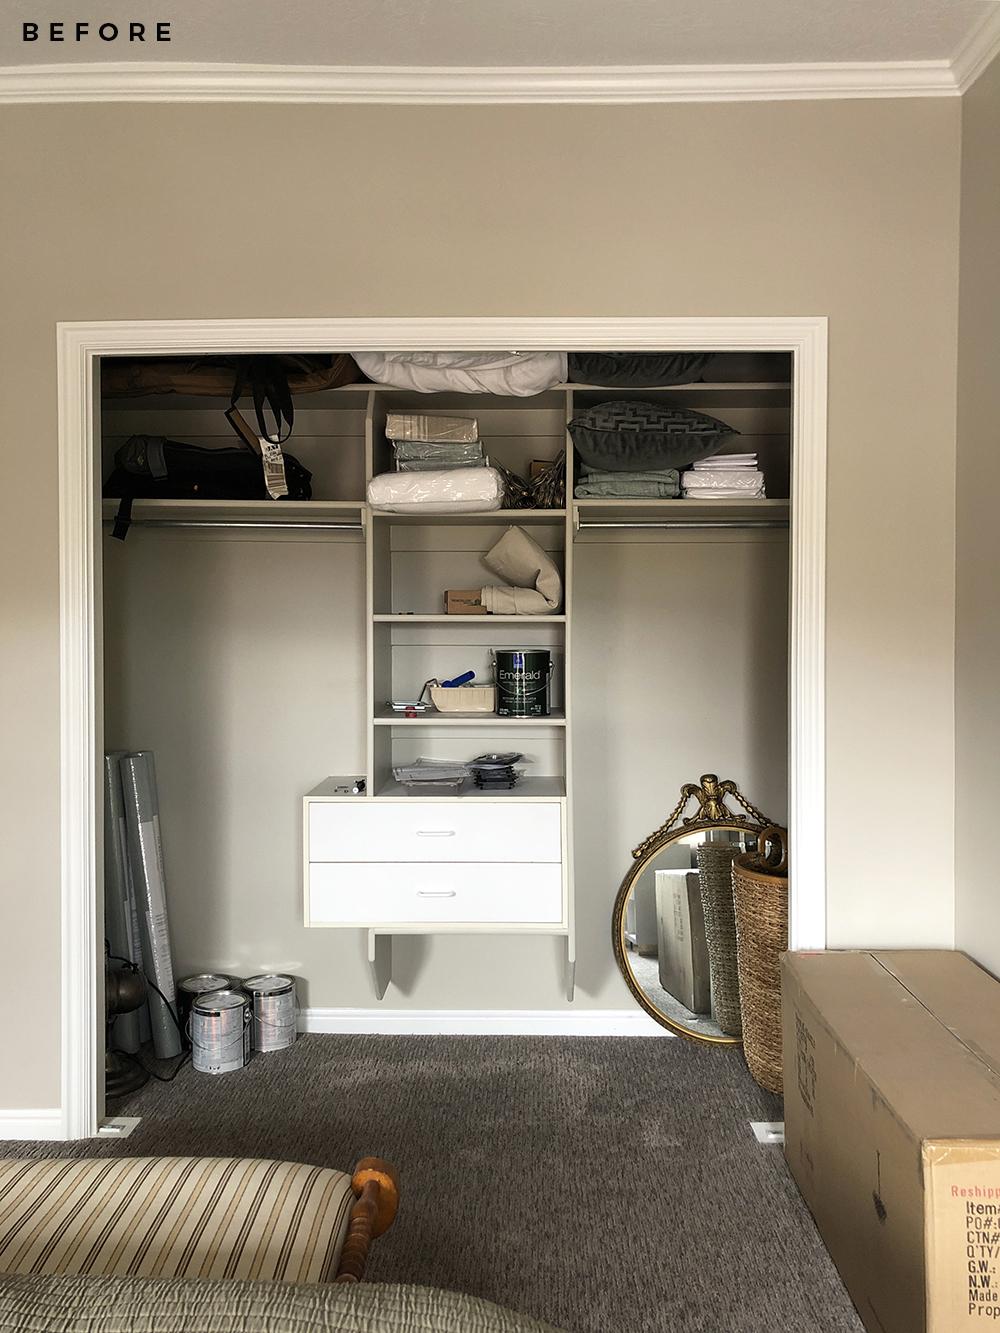 Guest Bedroom Design Plan - roomfortuesday.com